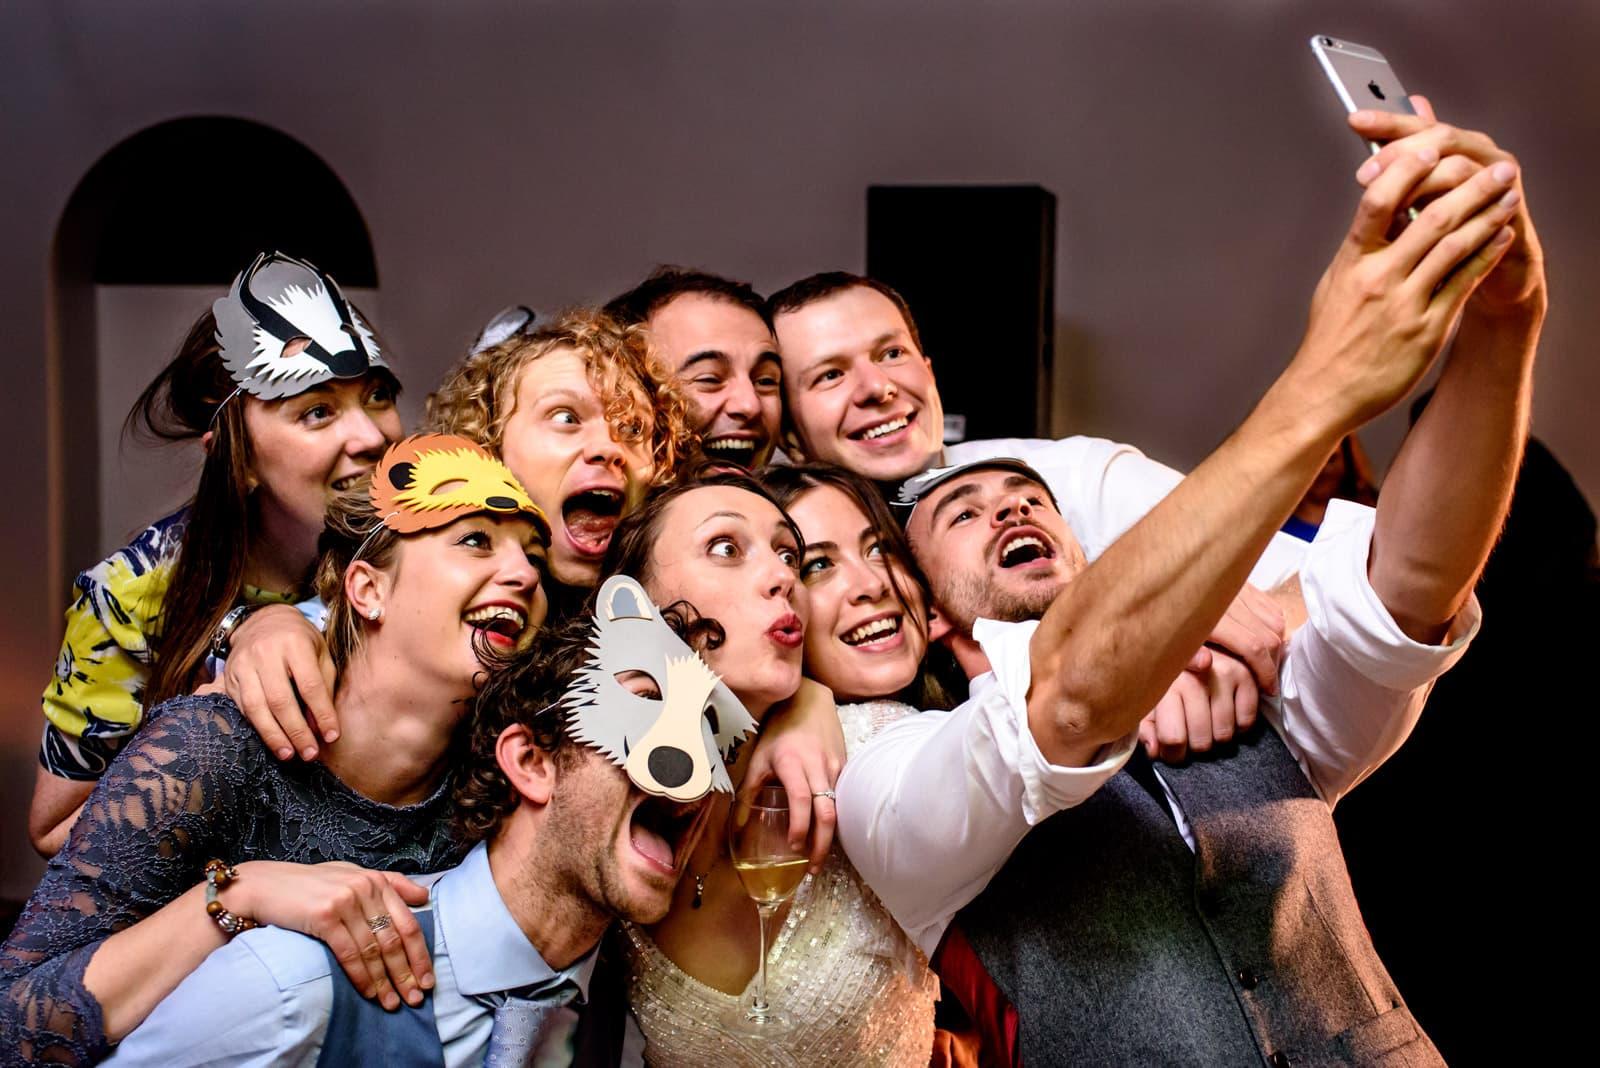 Group selfie on the wedding dance at Hampton court house